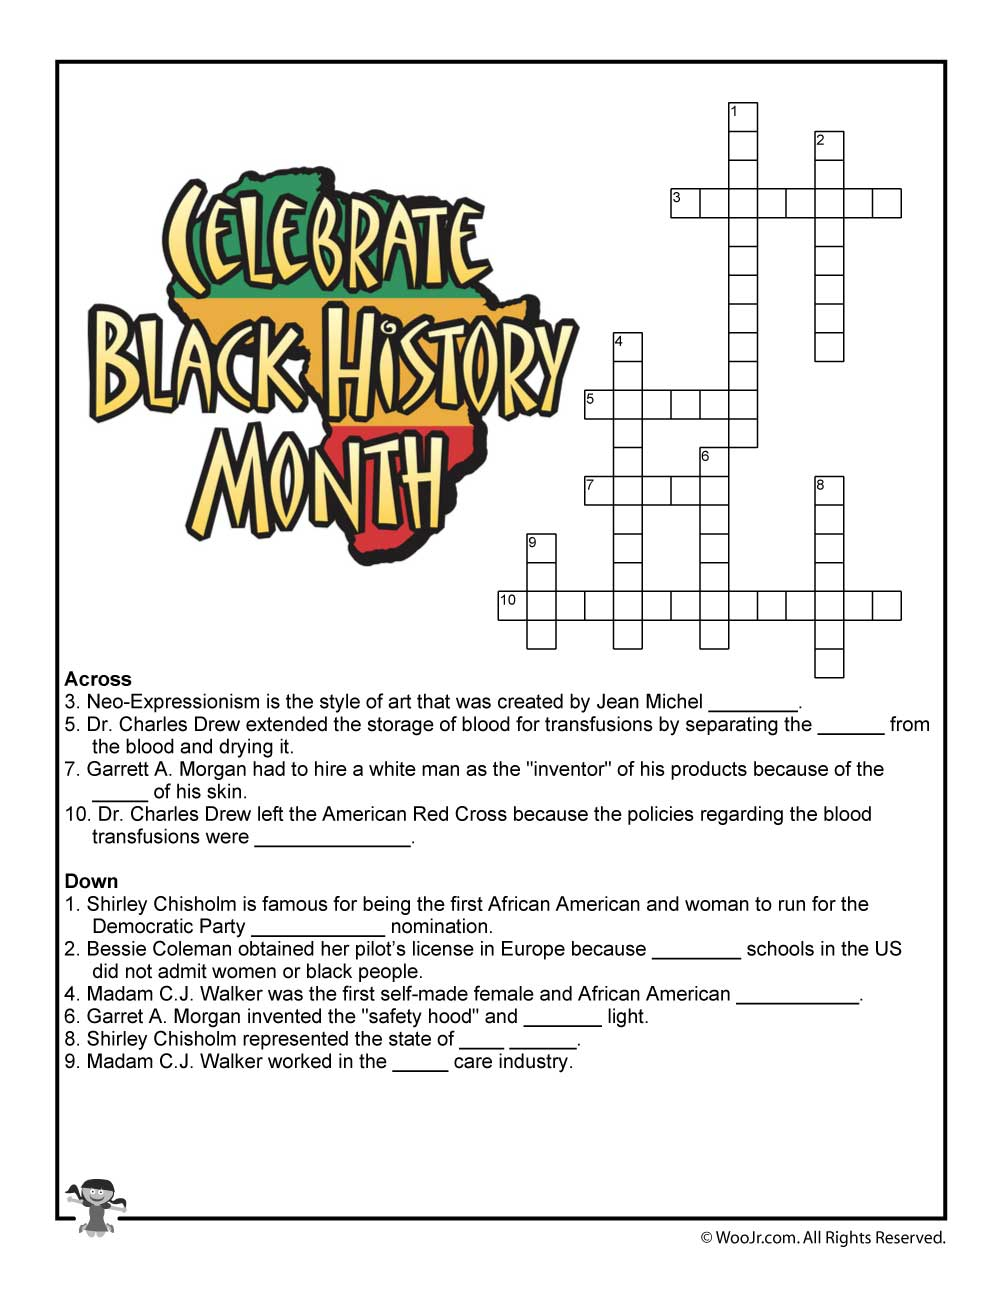 Free Black History Crossword Puzzles Printable